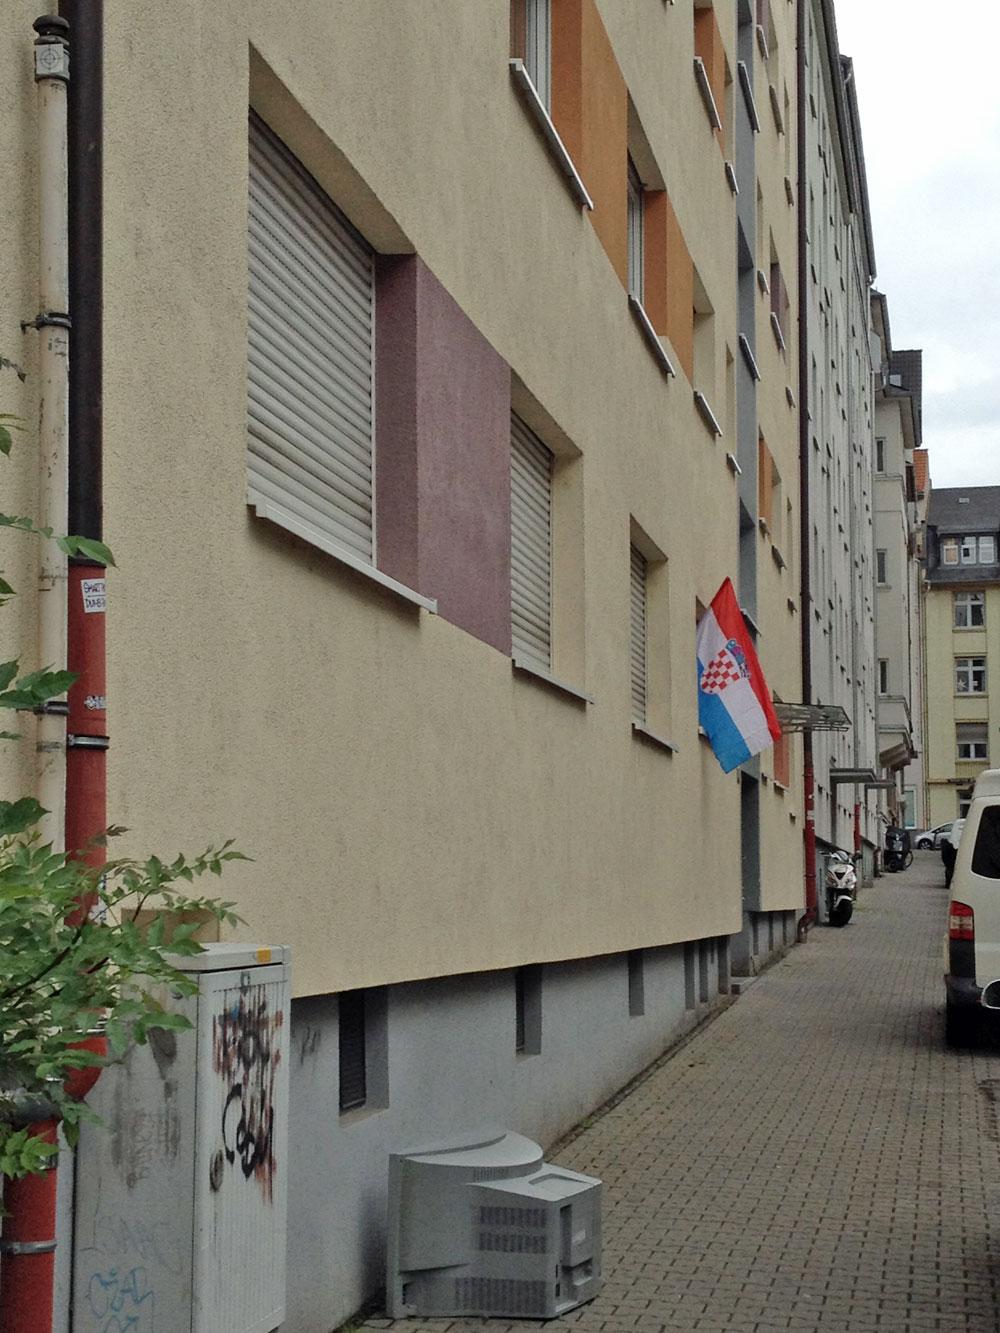 Kroatienfahne zur EURO 2106 in Frankfurt